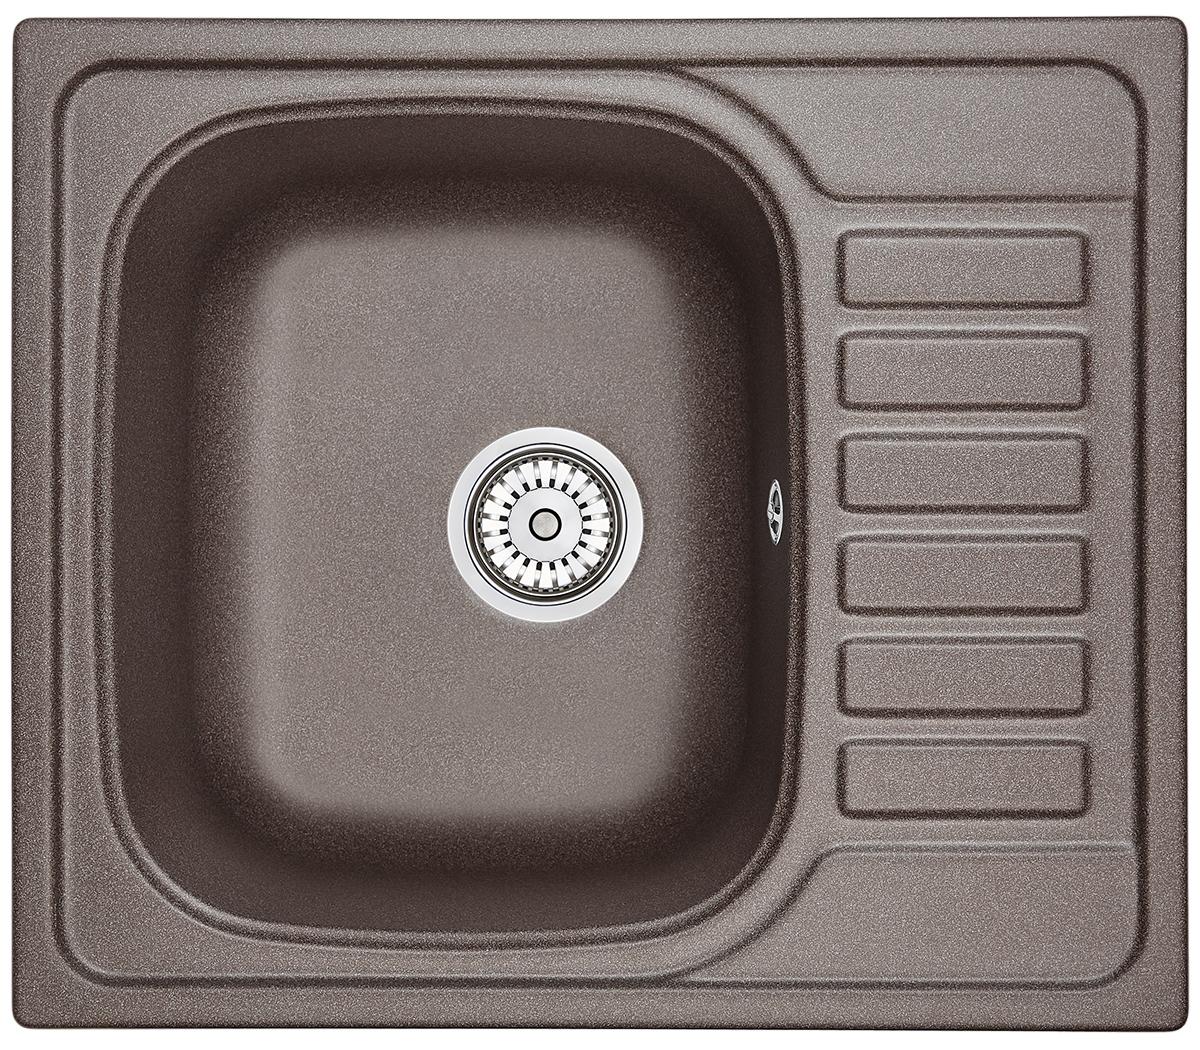 Мойка кухонная Granula Gr-5801 кухонная мойка granula 4201 классик